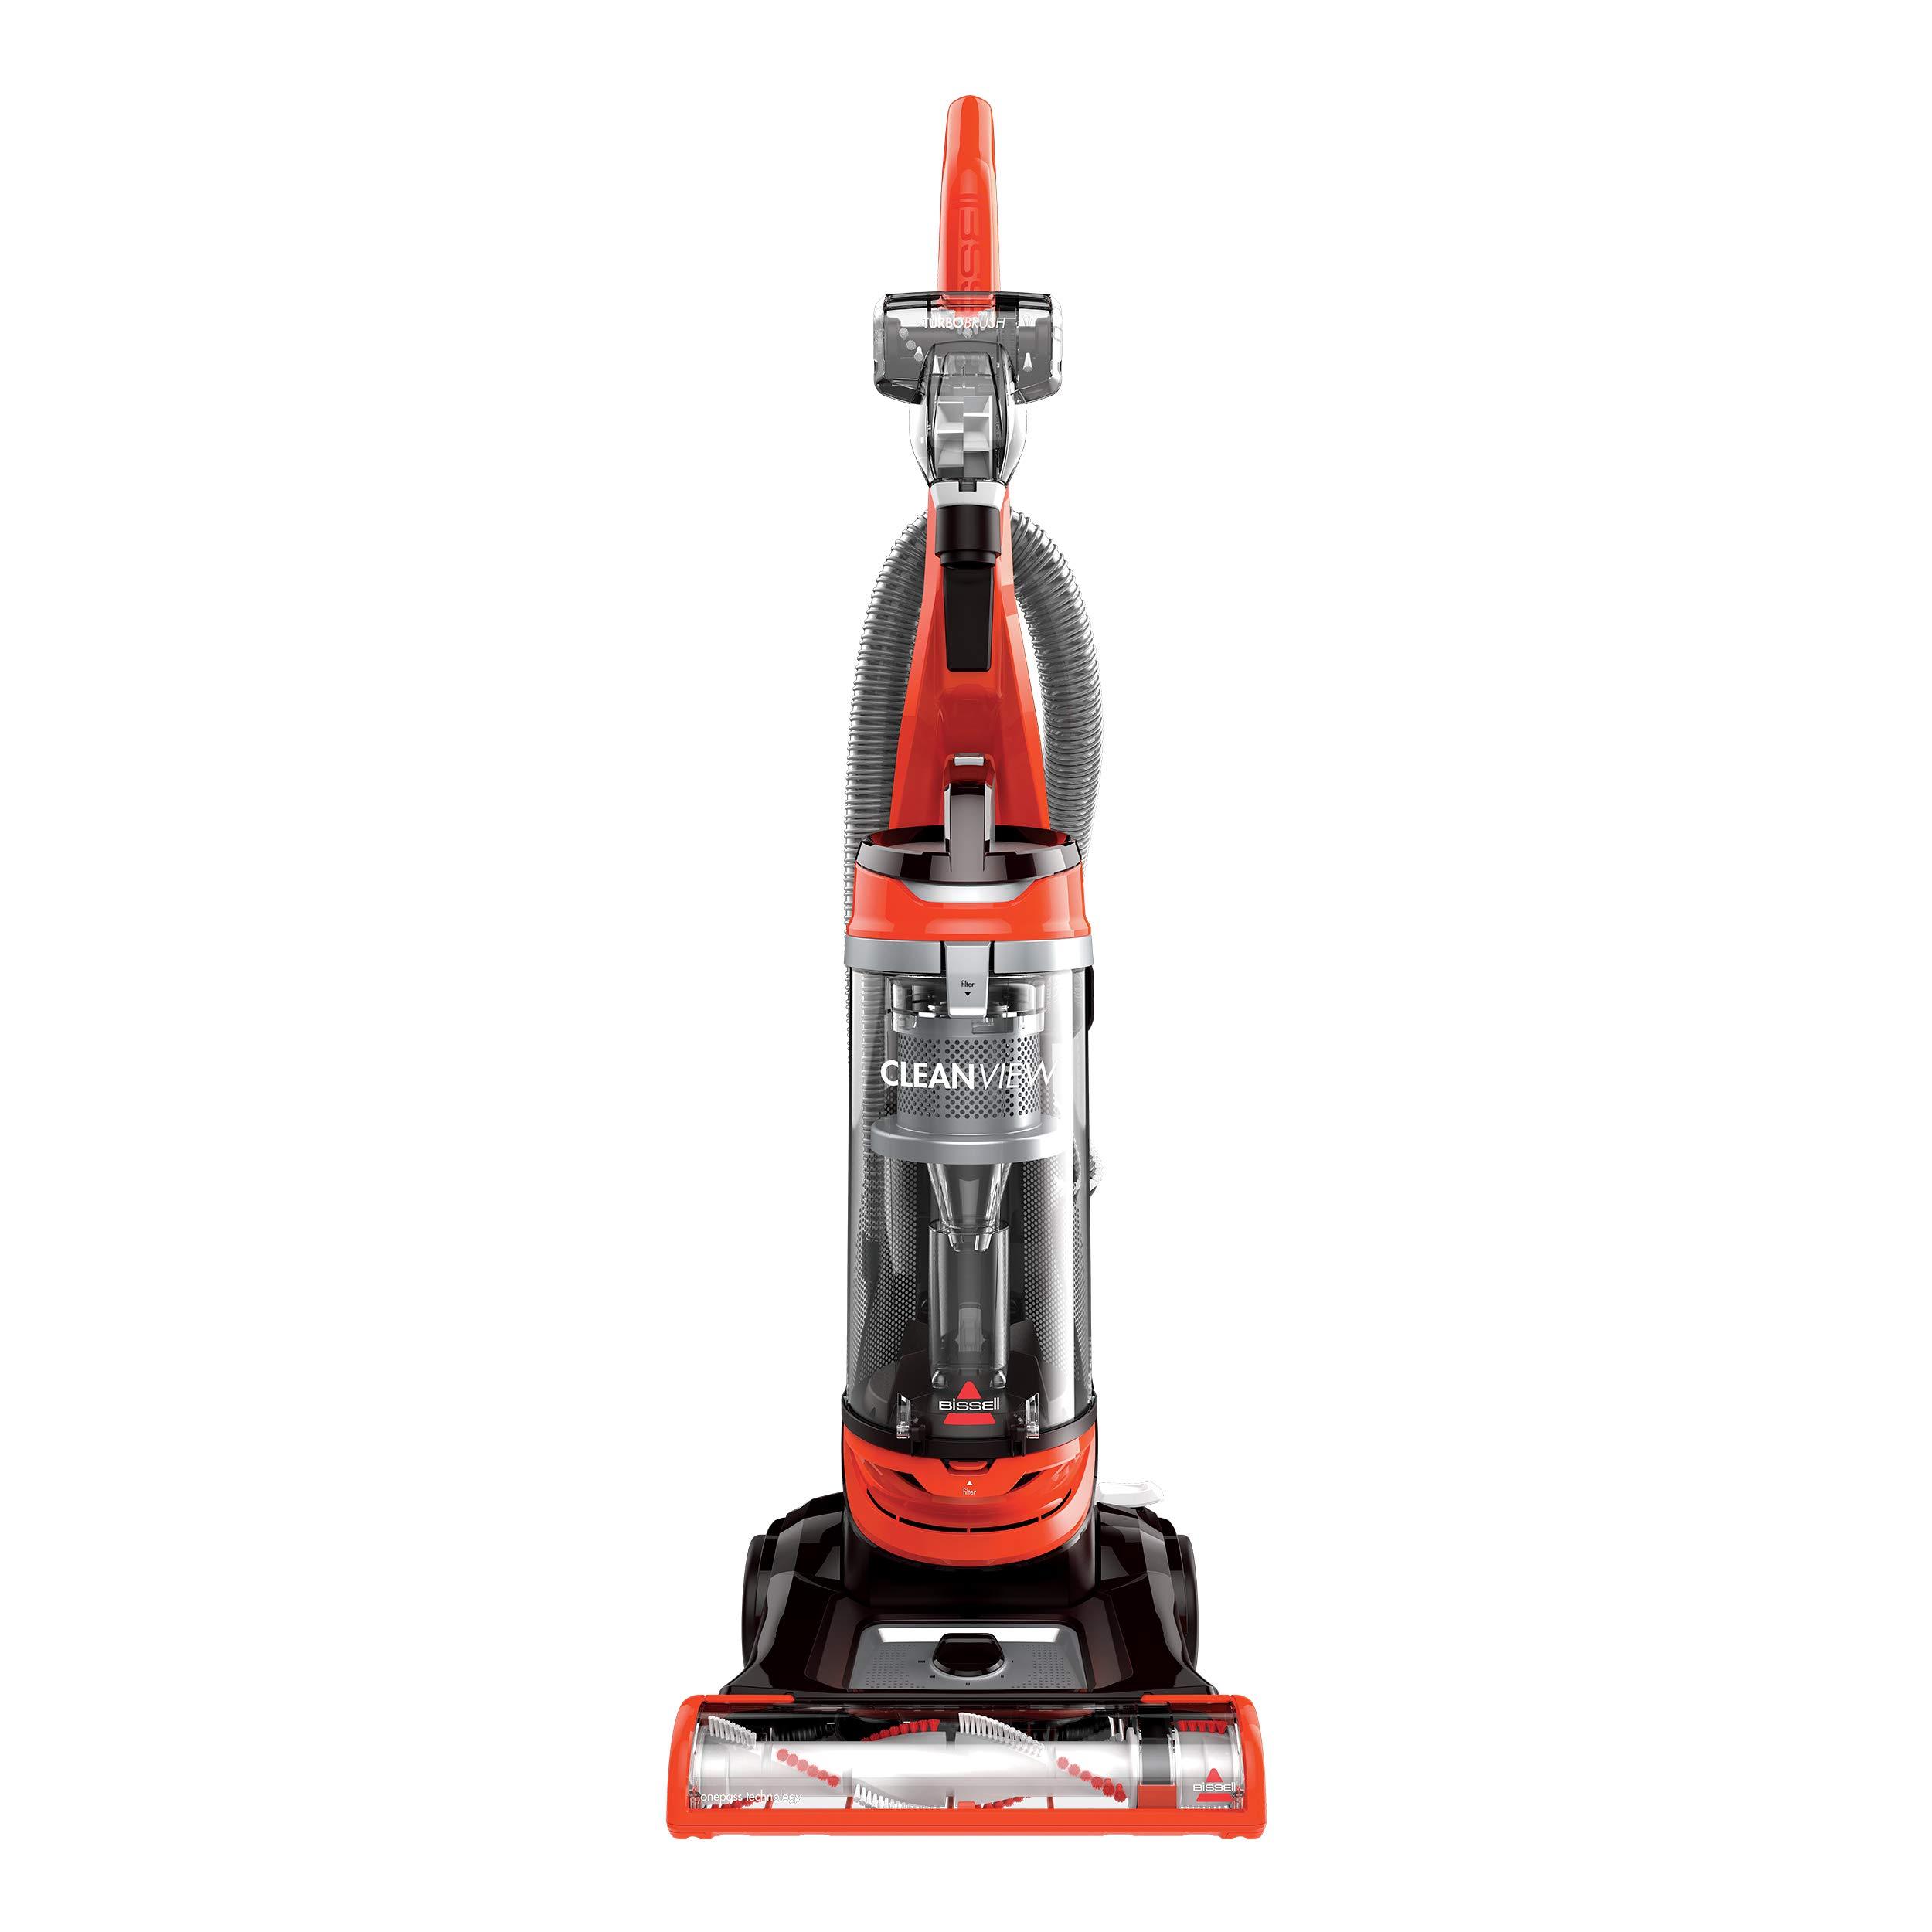 BISSELL Cleanview Bagless Vacuum Cleaner, 2486, Orange by Bissell